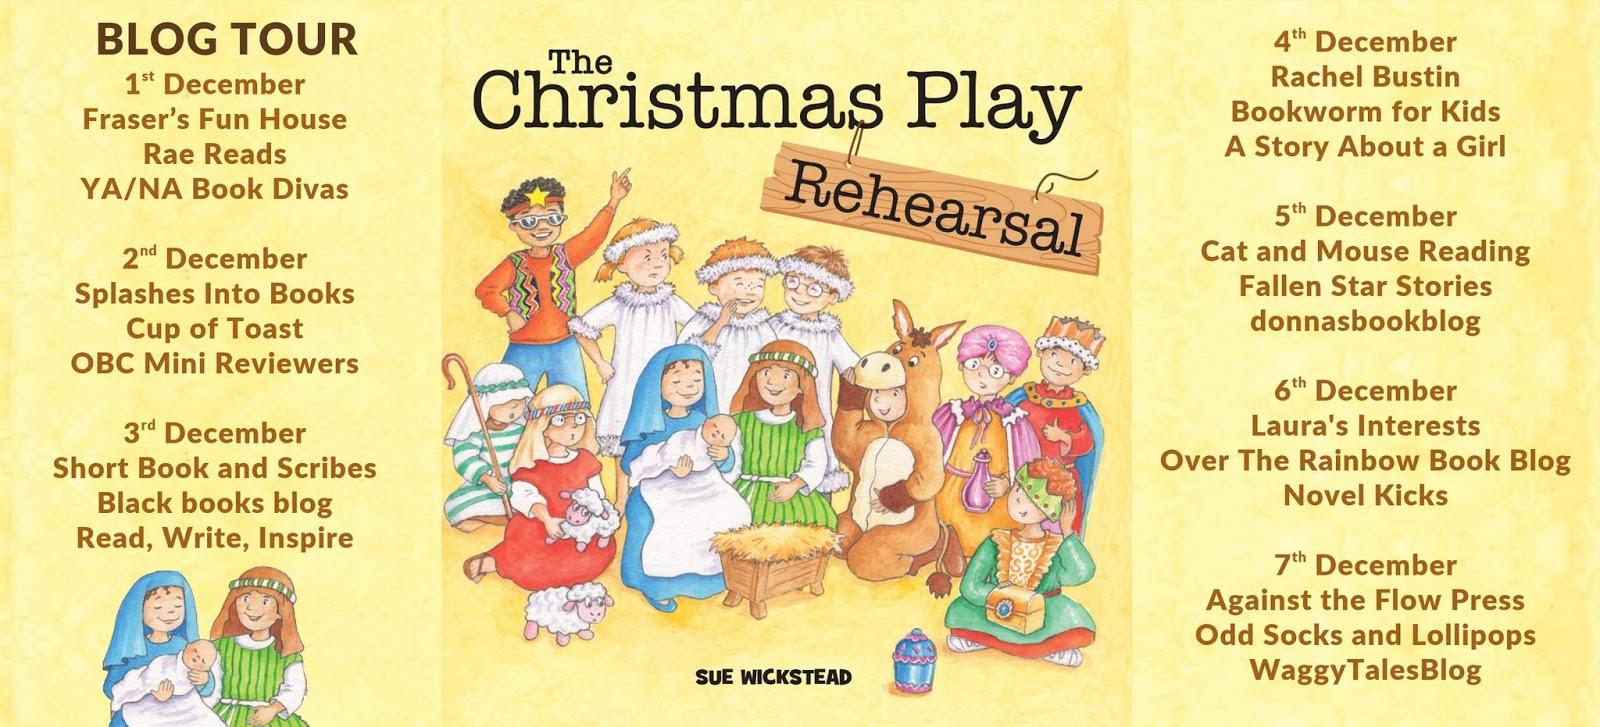 Short Christmas Play.Blog Tour The Christmas Play Rehearsal